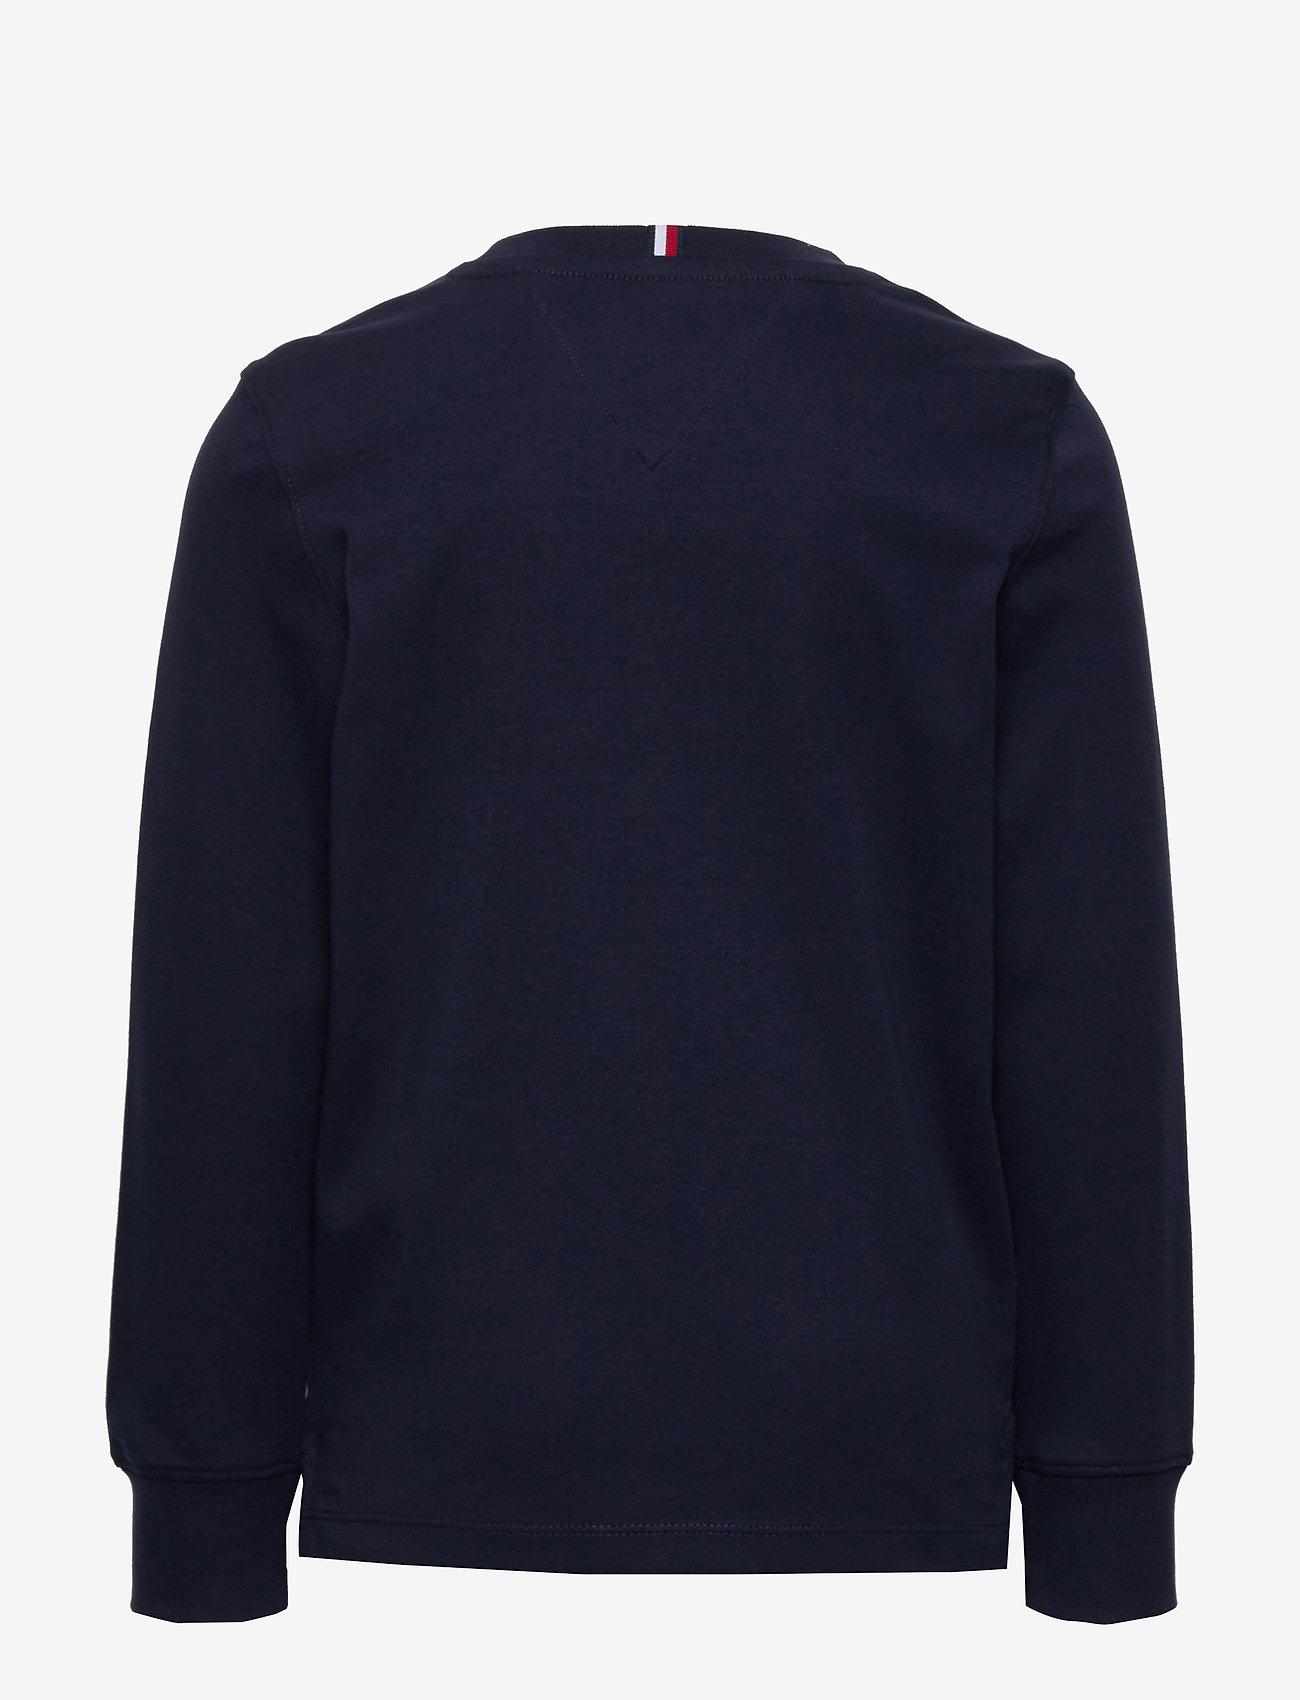 Tommy Hilfiger - GLOBAL STRIPE GRAPHIC TEE L/S - sweatshirts - twilight navy - 1